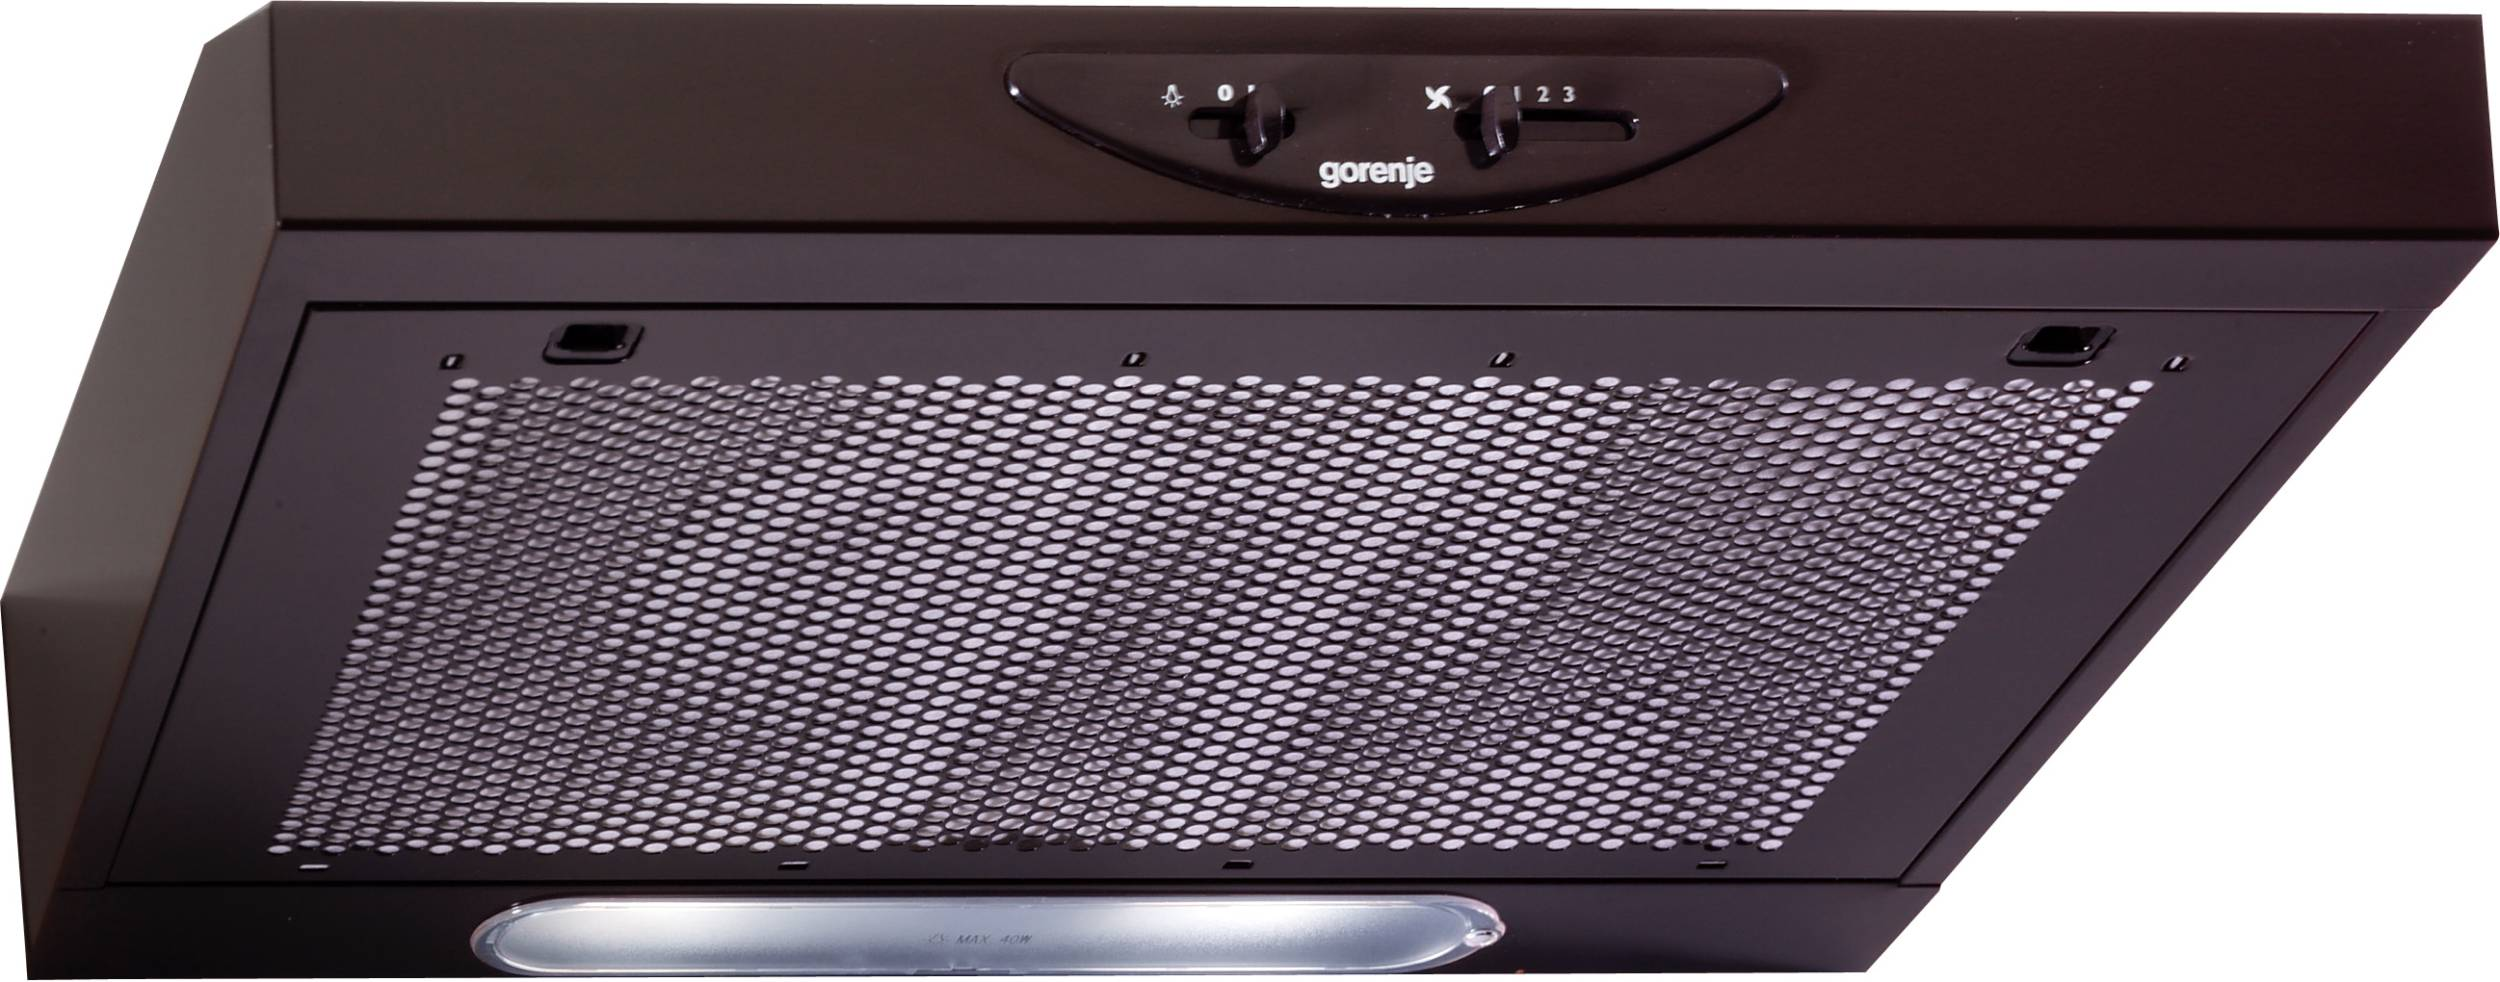 Gorenje DU611B Podugradni kuhinjski aspirator 59,9 × 13,2 × 51 cm